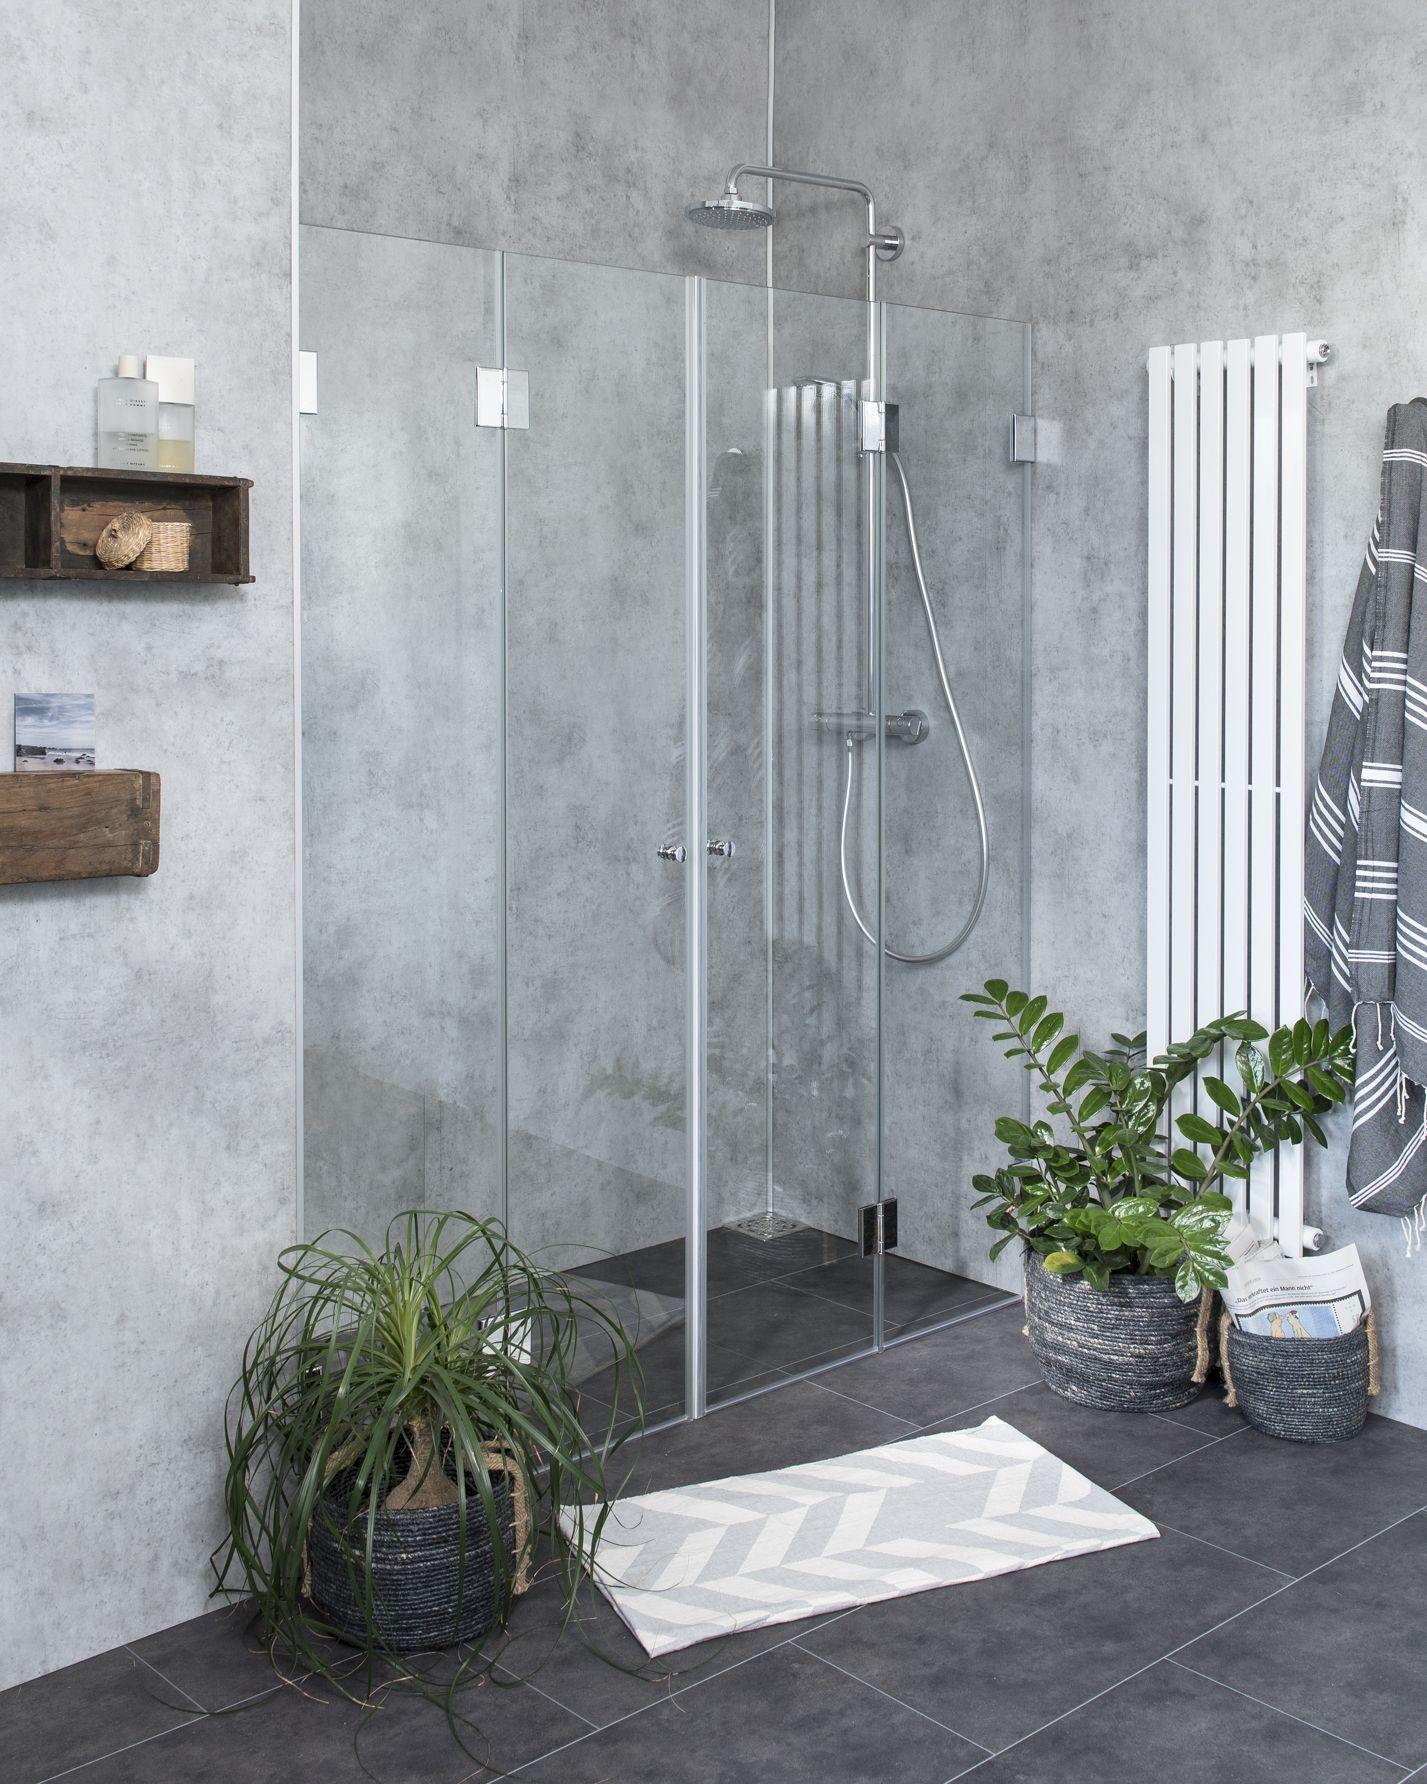 falt duschabtrennung f r nische klarglas chrom h 195cm combia a2n. Black Bedroom Furniture Sets. Home Design Ideas